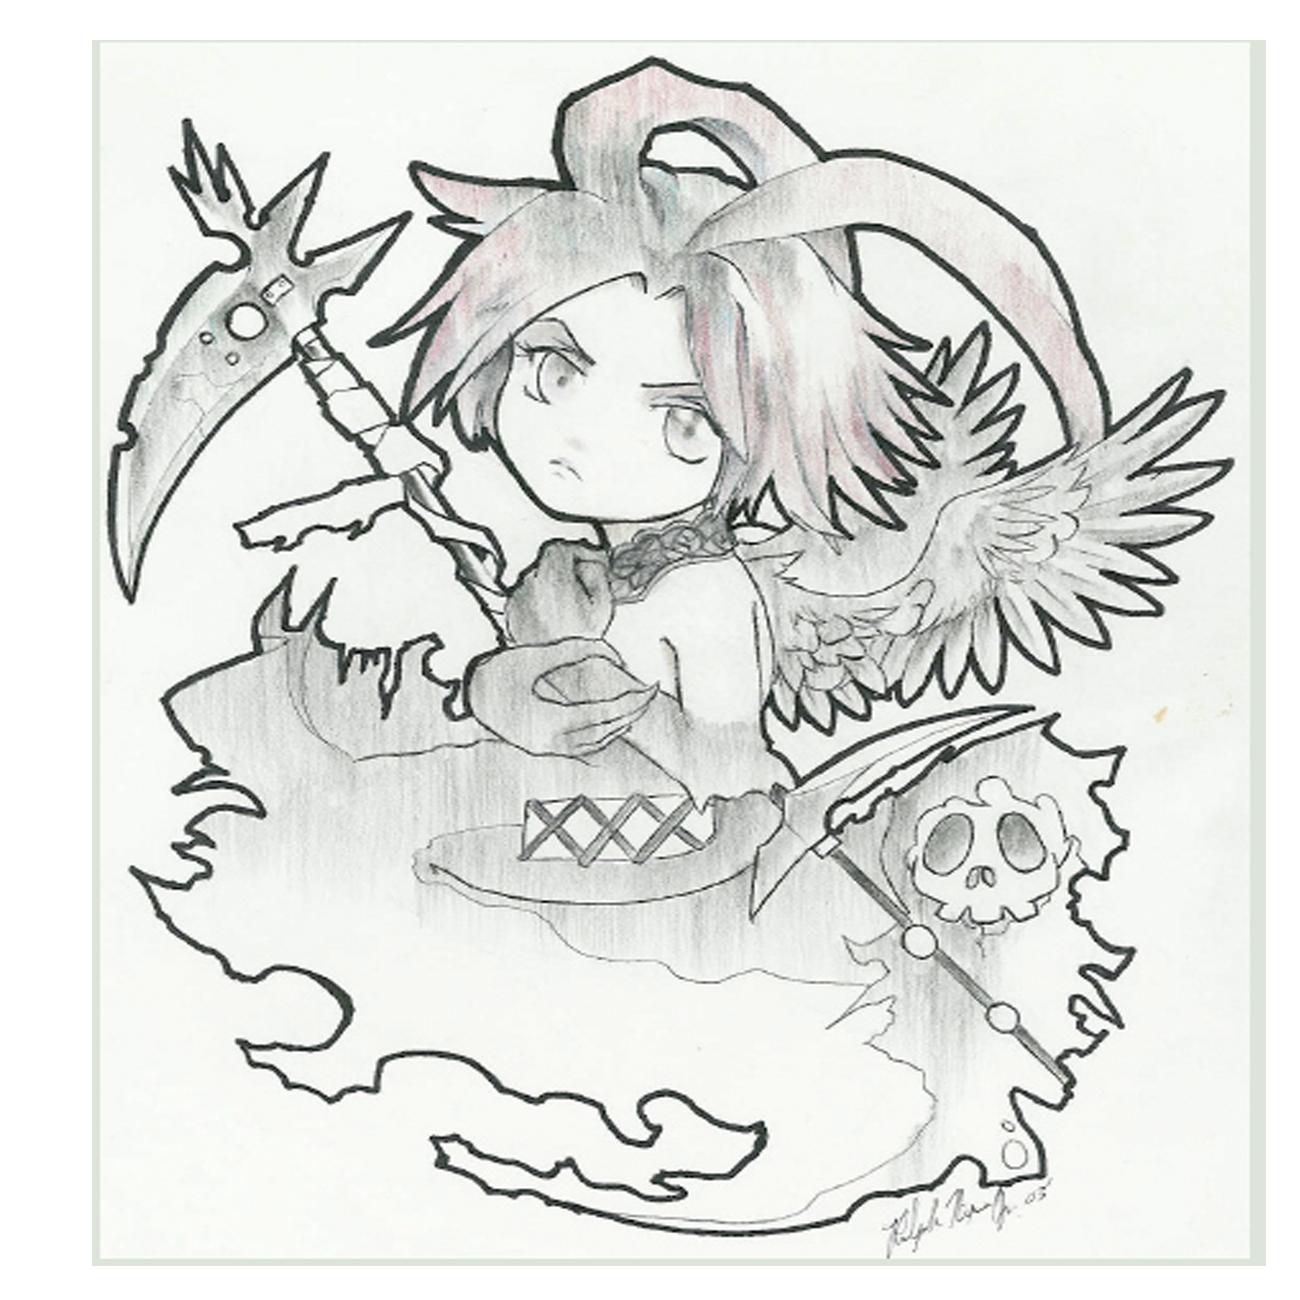 Chibi style Death Angel